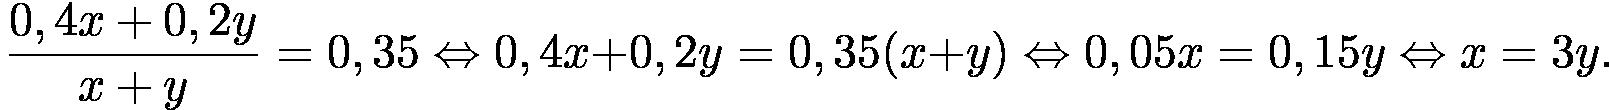 http://reshuege.ru/formula/6f/6f615ec80e42ffe7e875bc2a4aa06604p.png